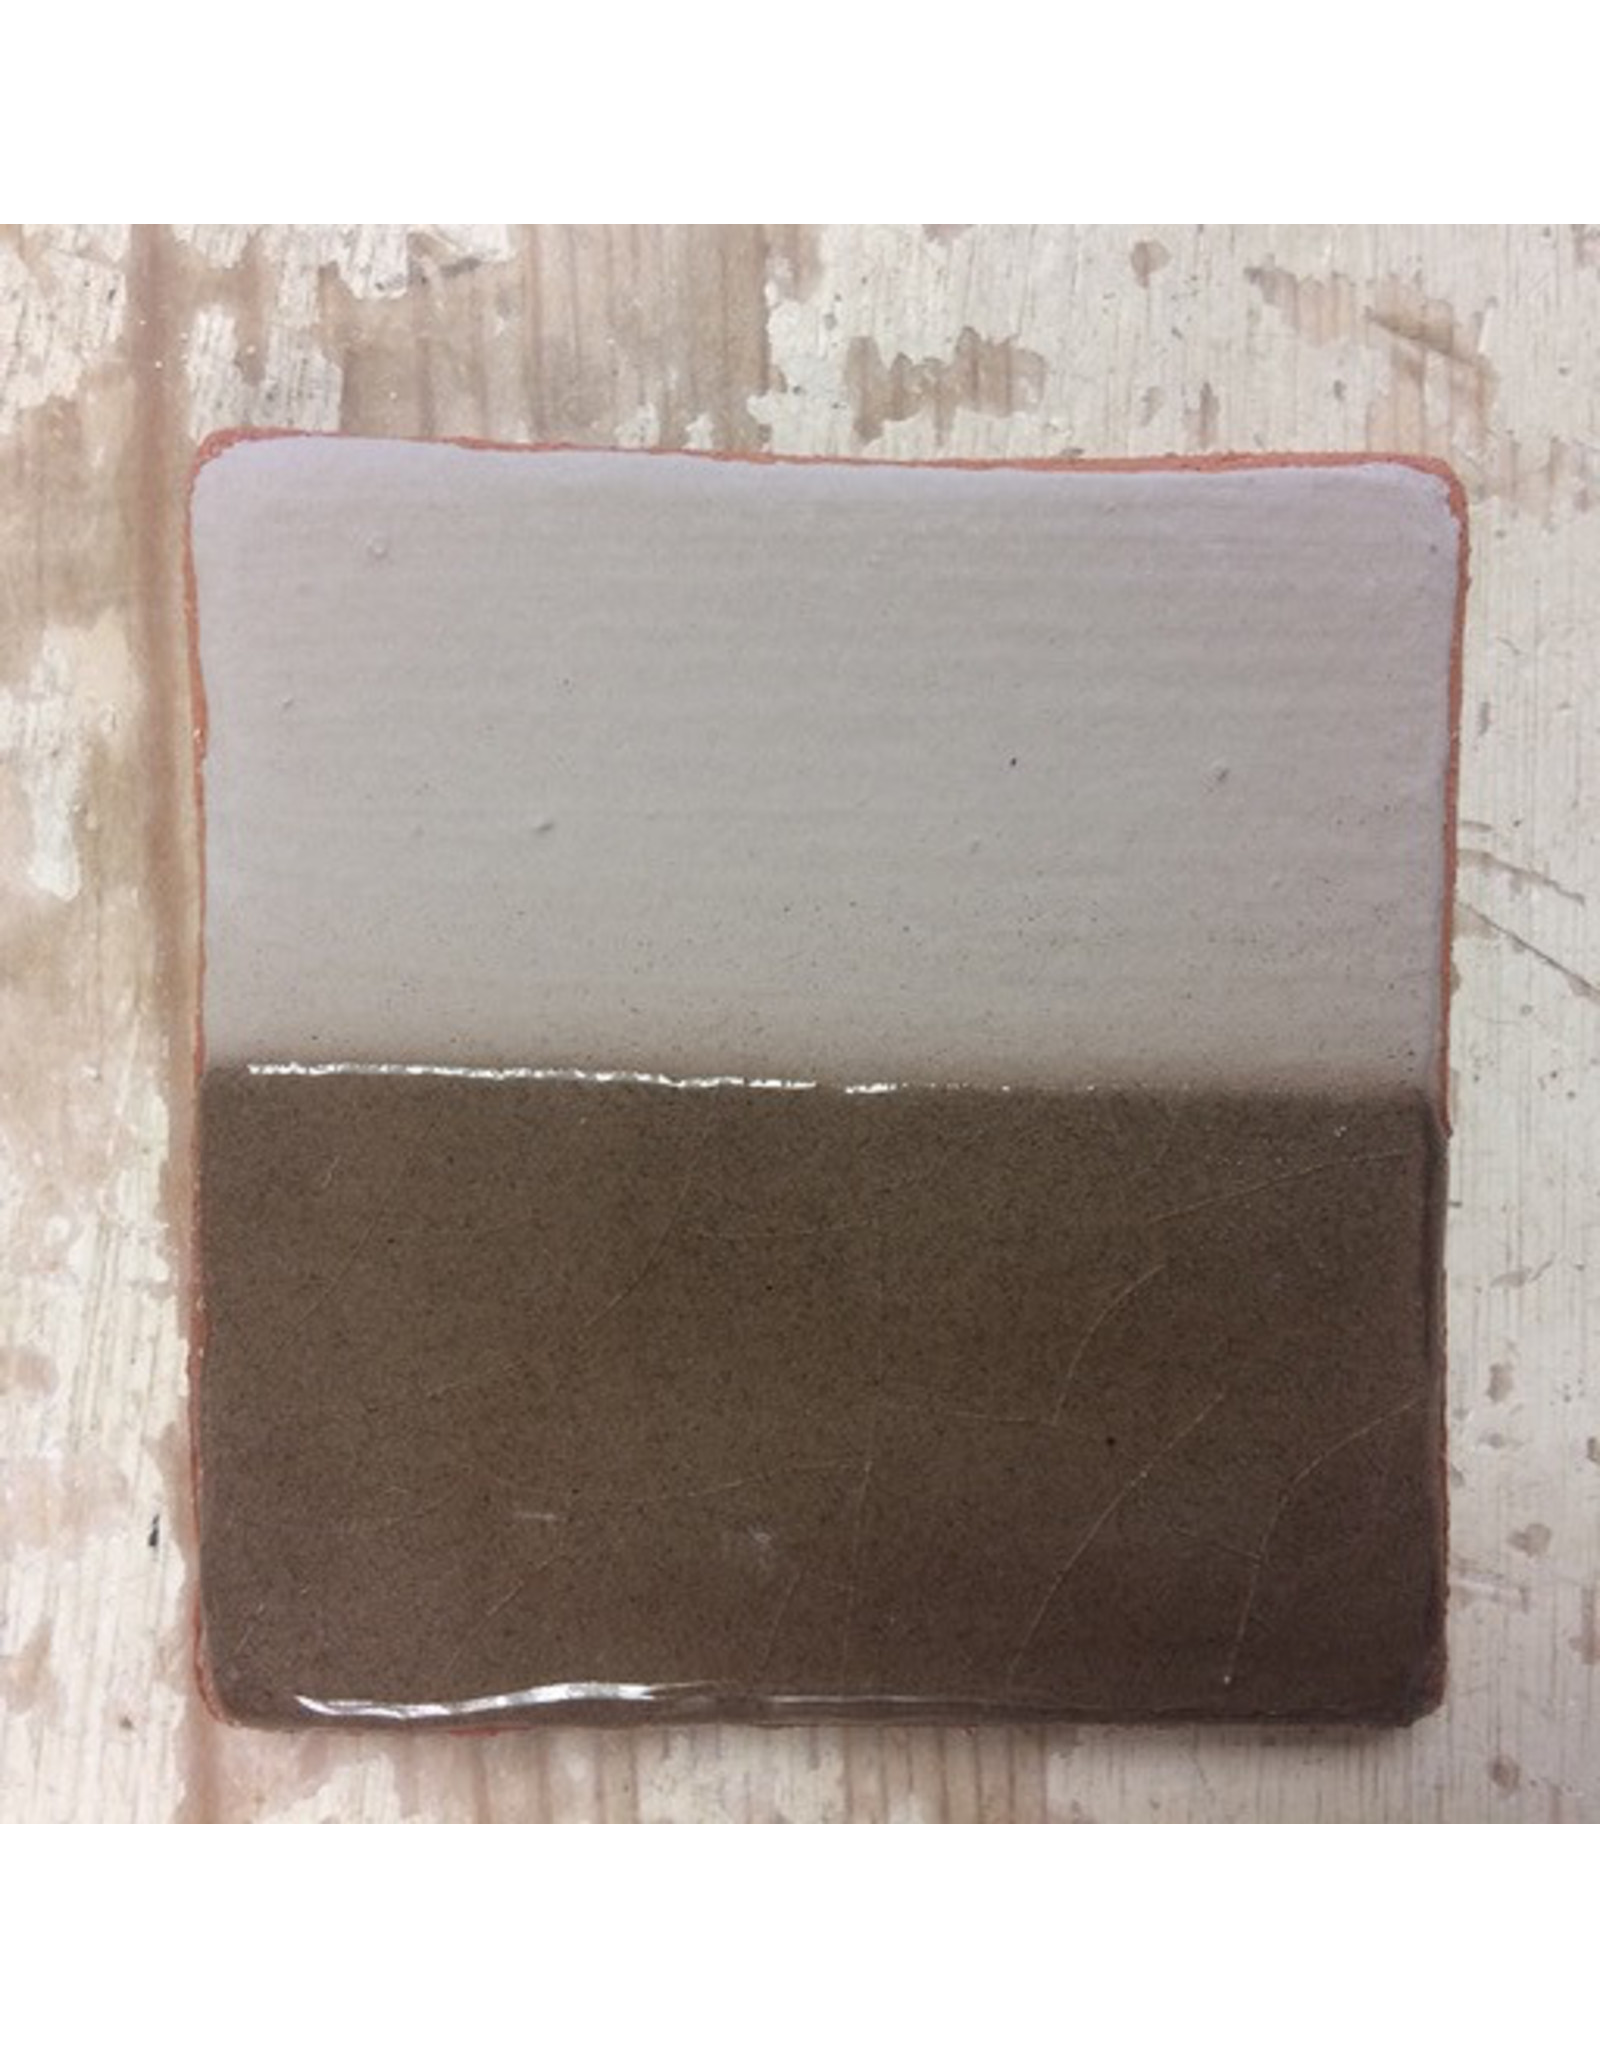 Scarva Shoveller Brown Decorating Slip 5 litre